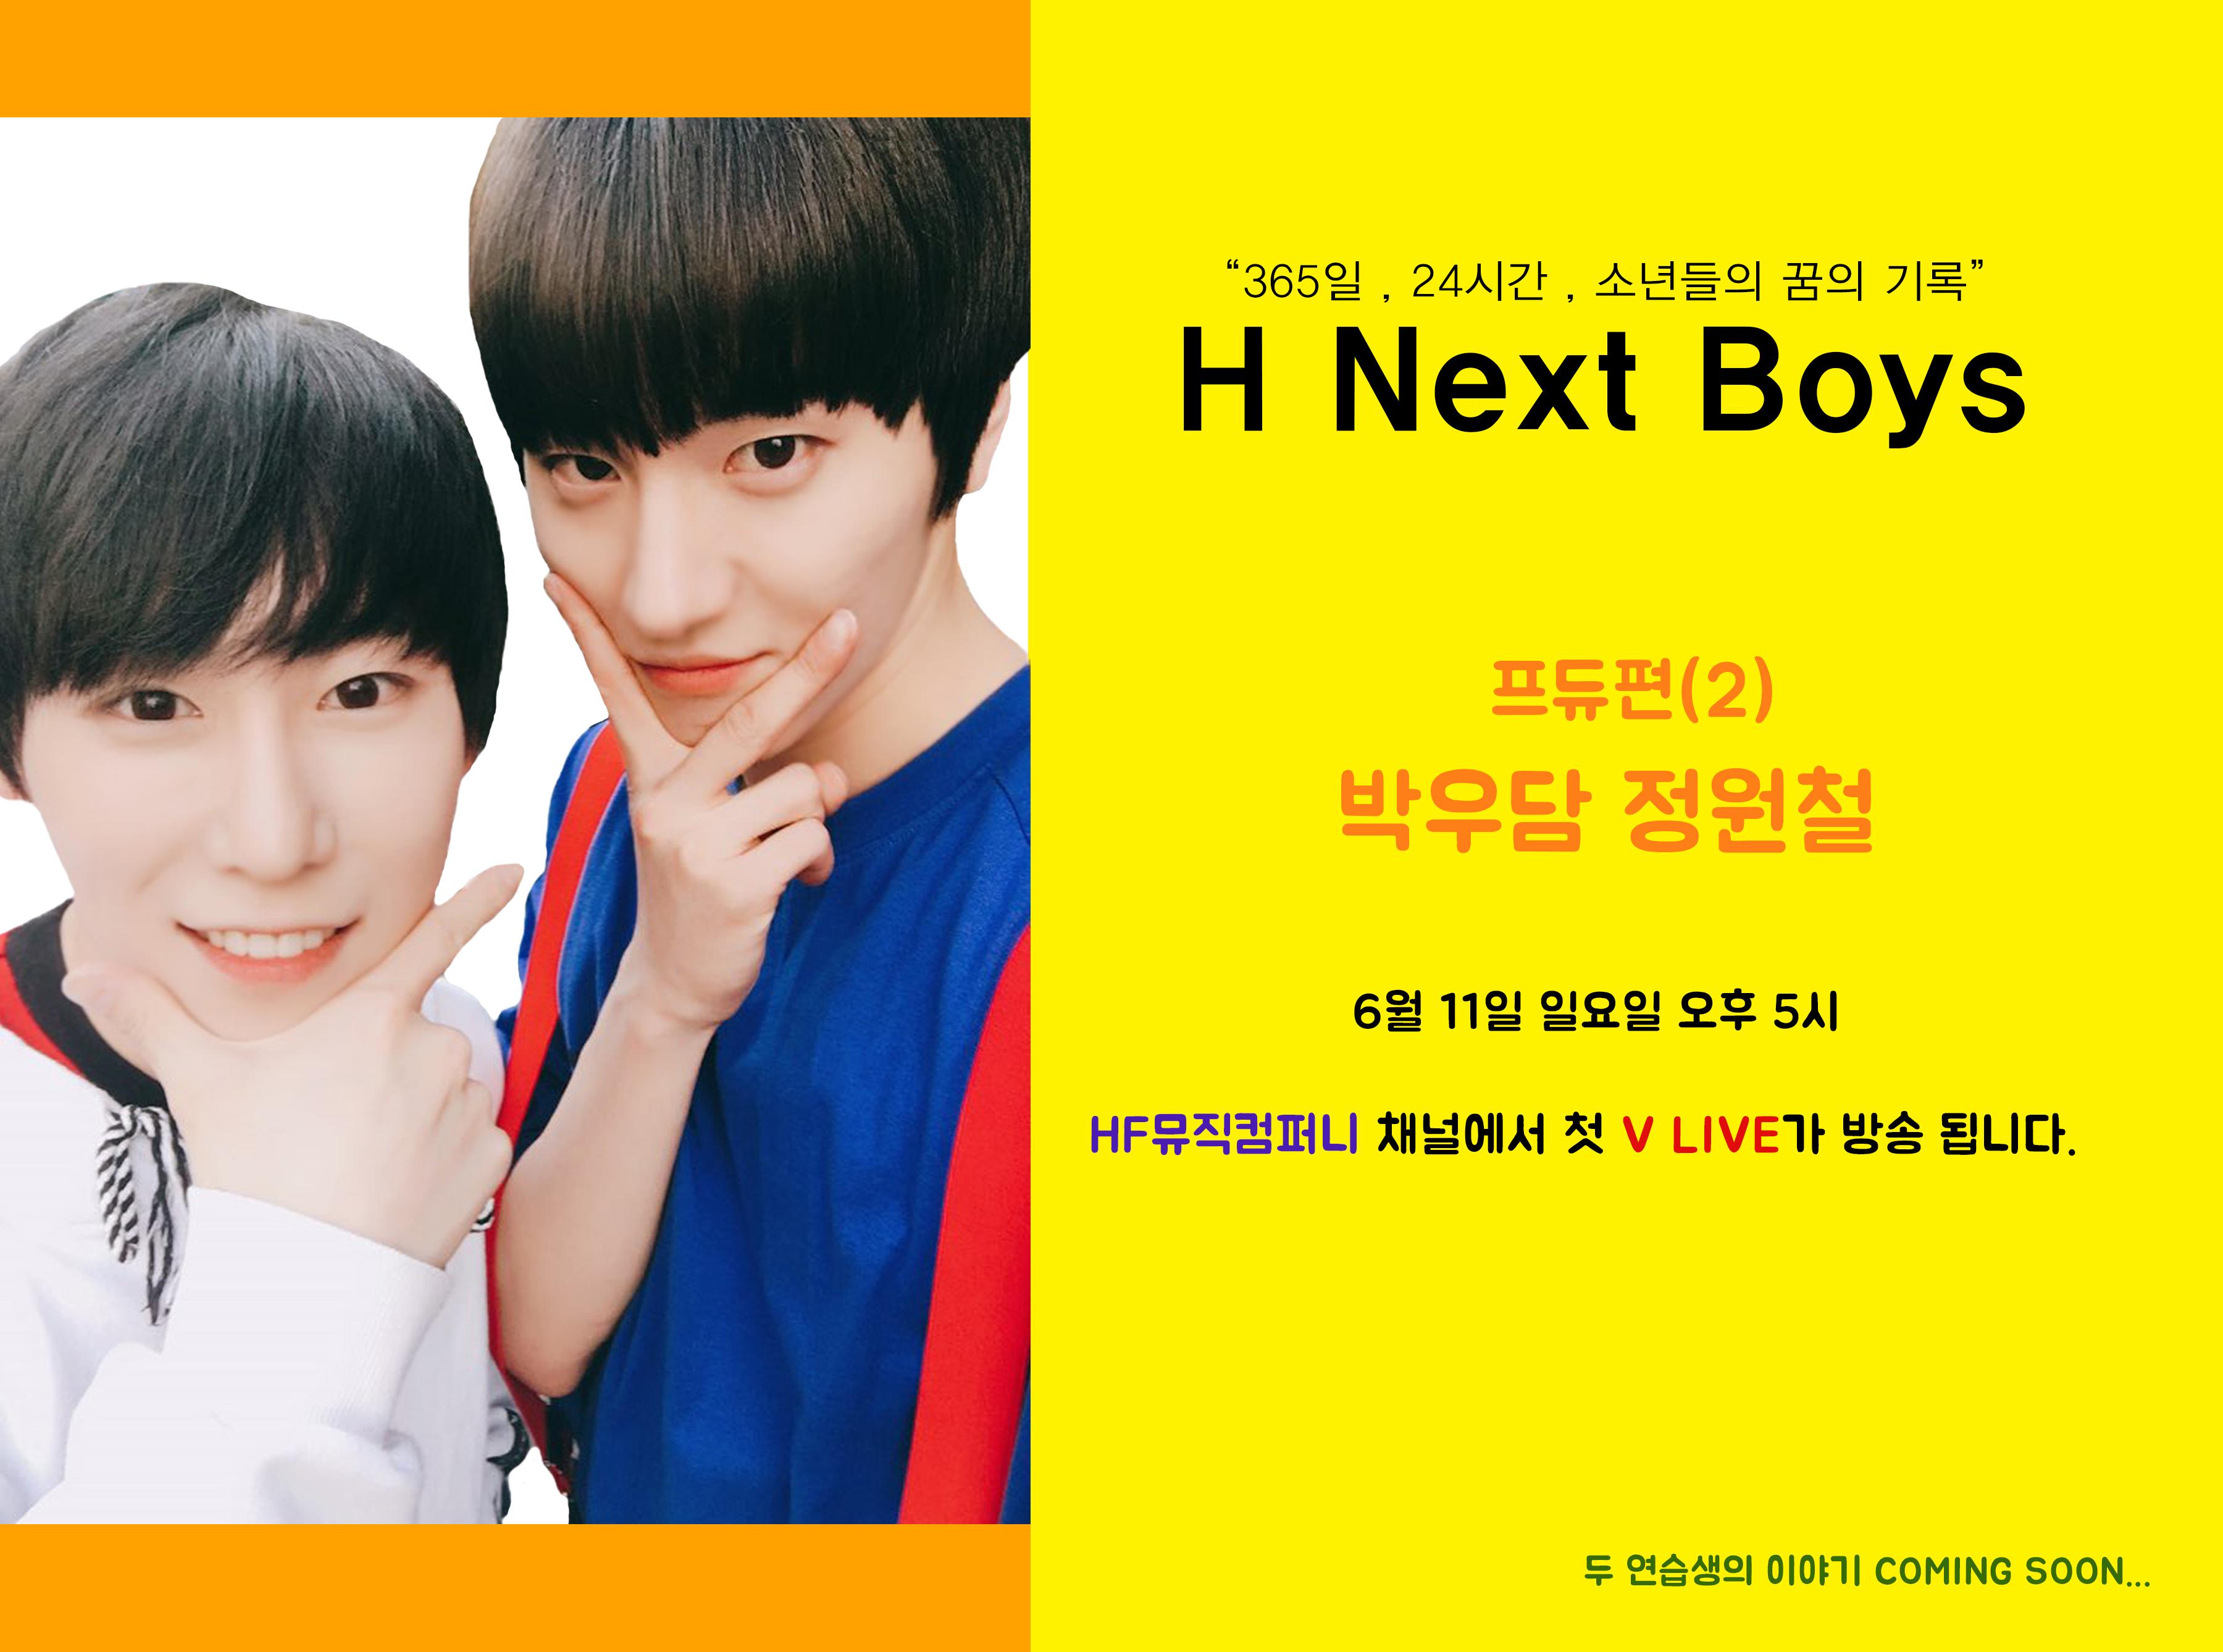 [HNB] 소년들의 꿈의 기록 - 프듀편(2) 박우담, 정원철